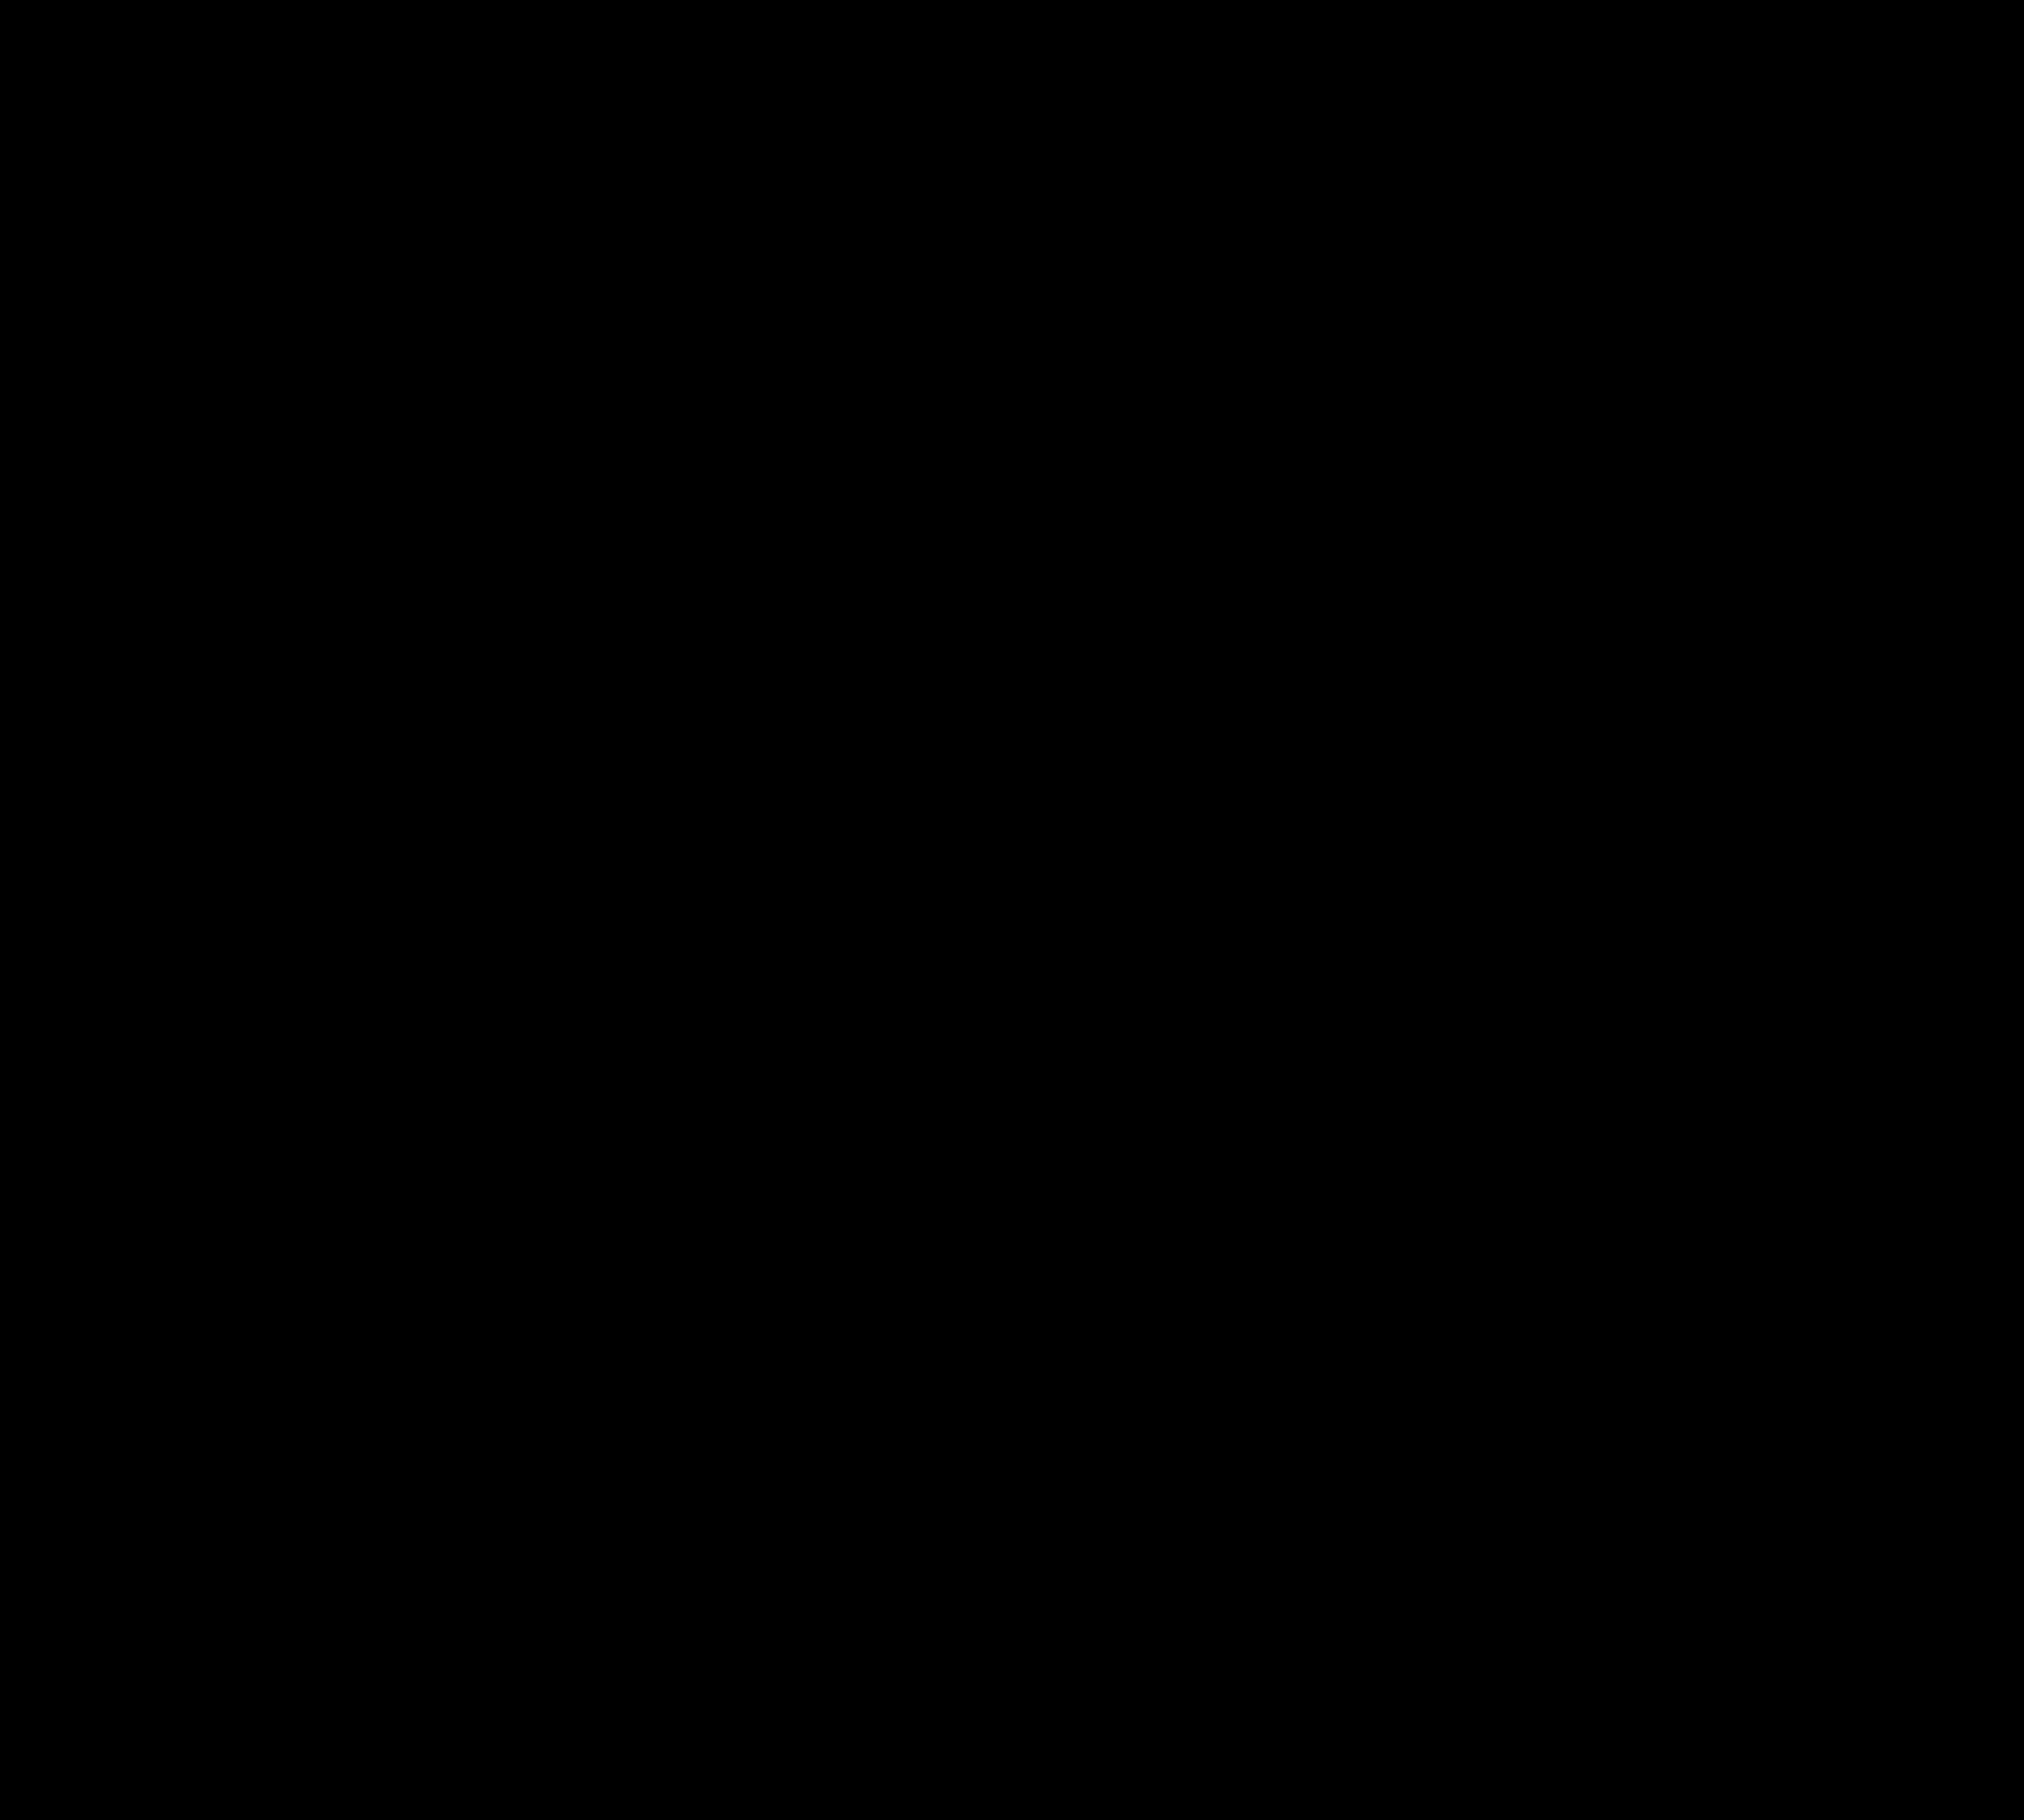 Japanese kanji transparent clipart.